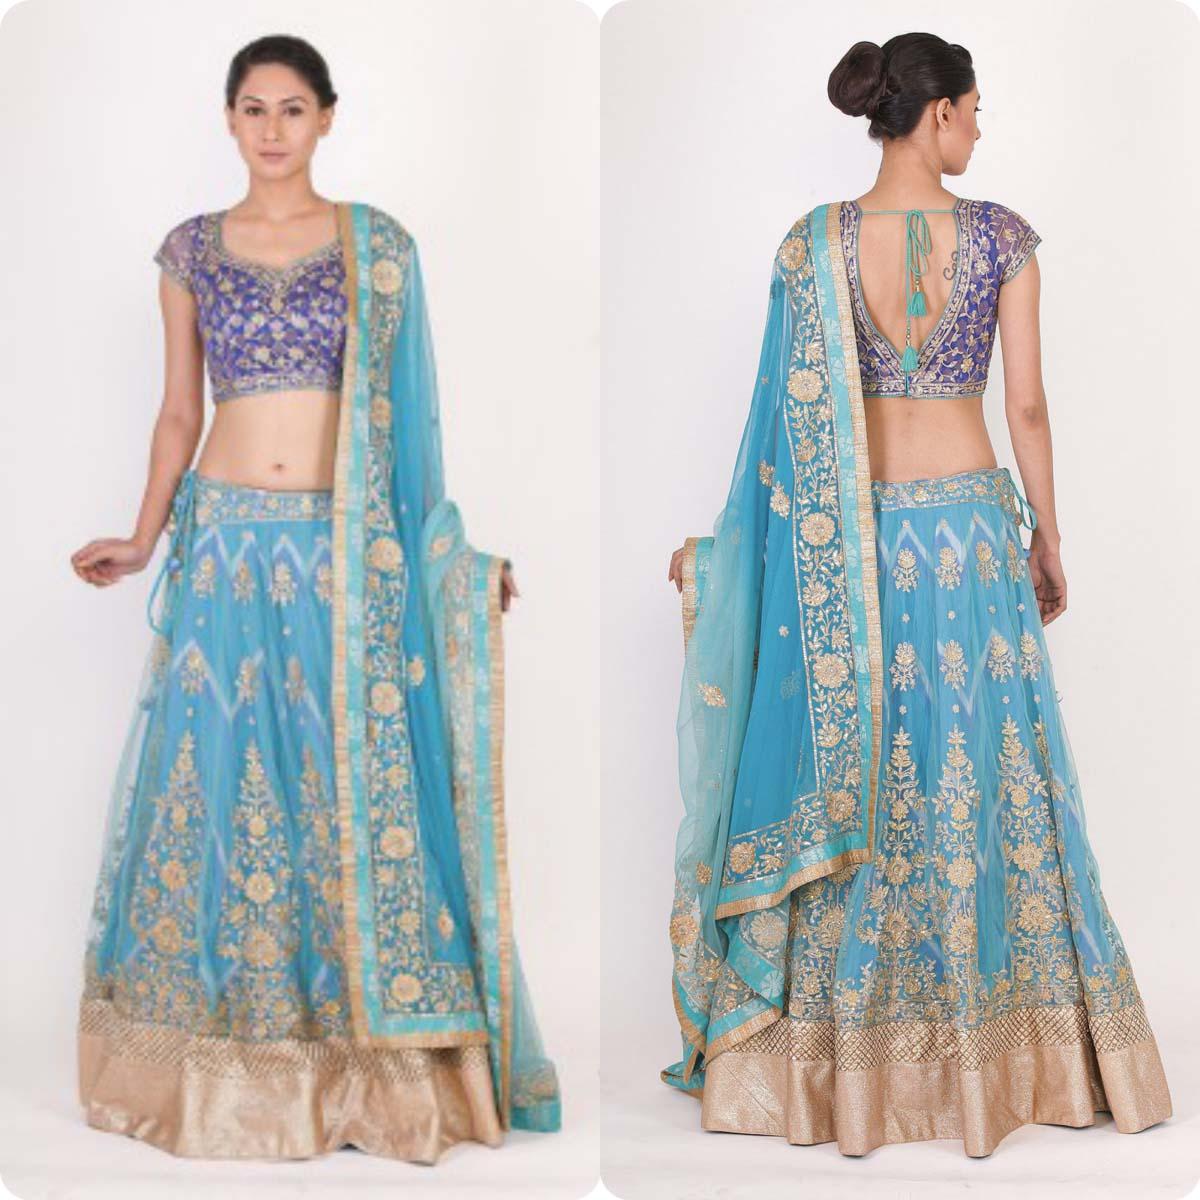 bridal-classic-vibrant-color-lehenga